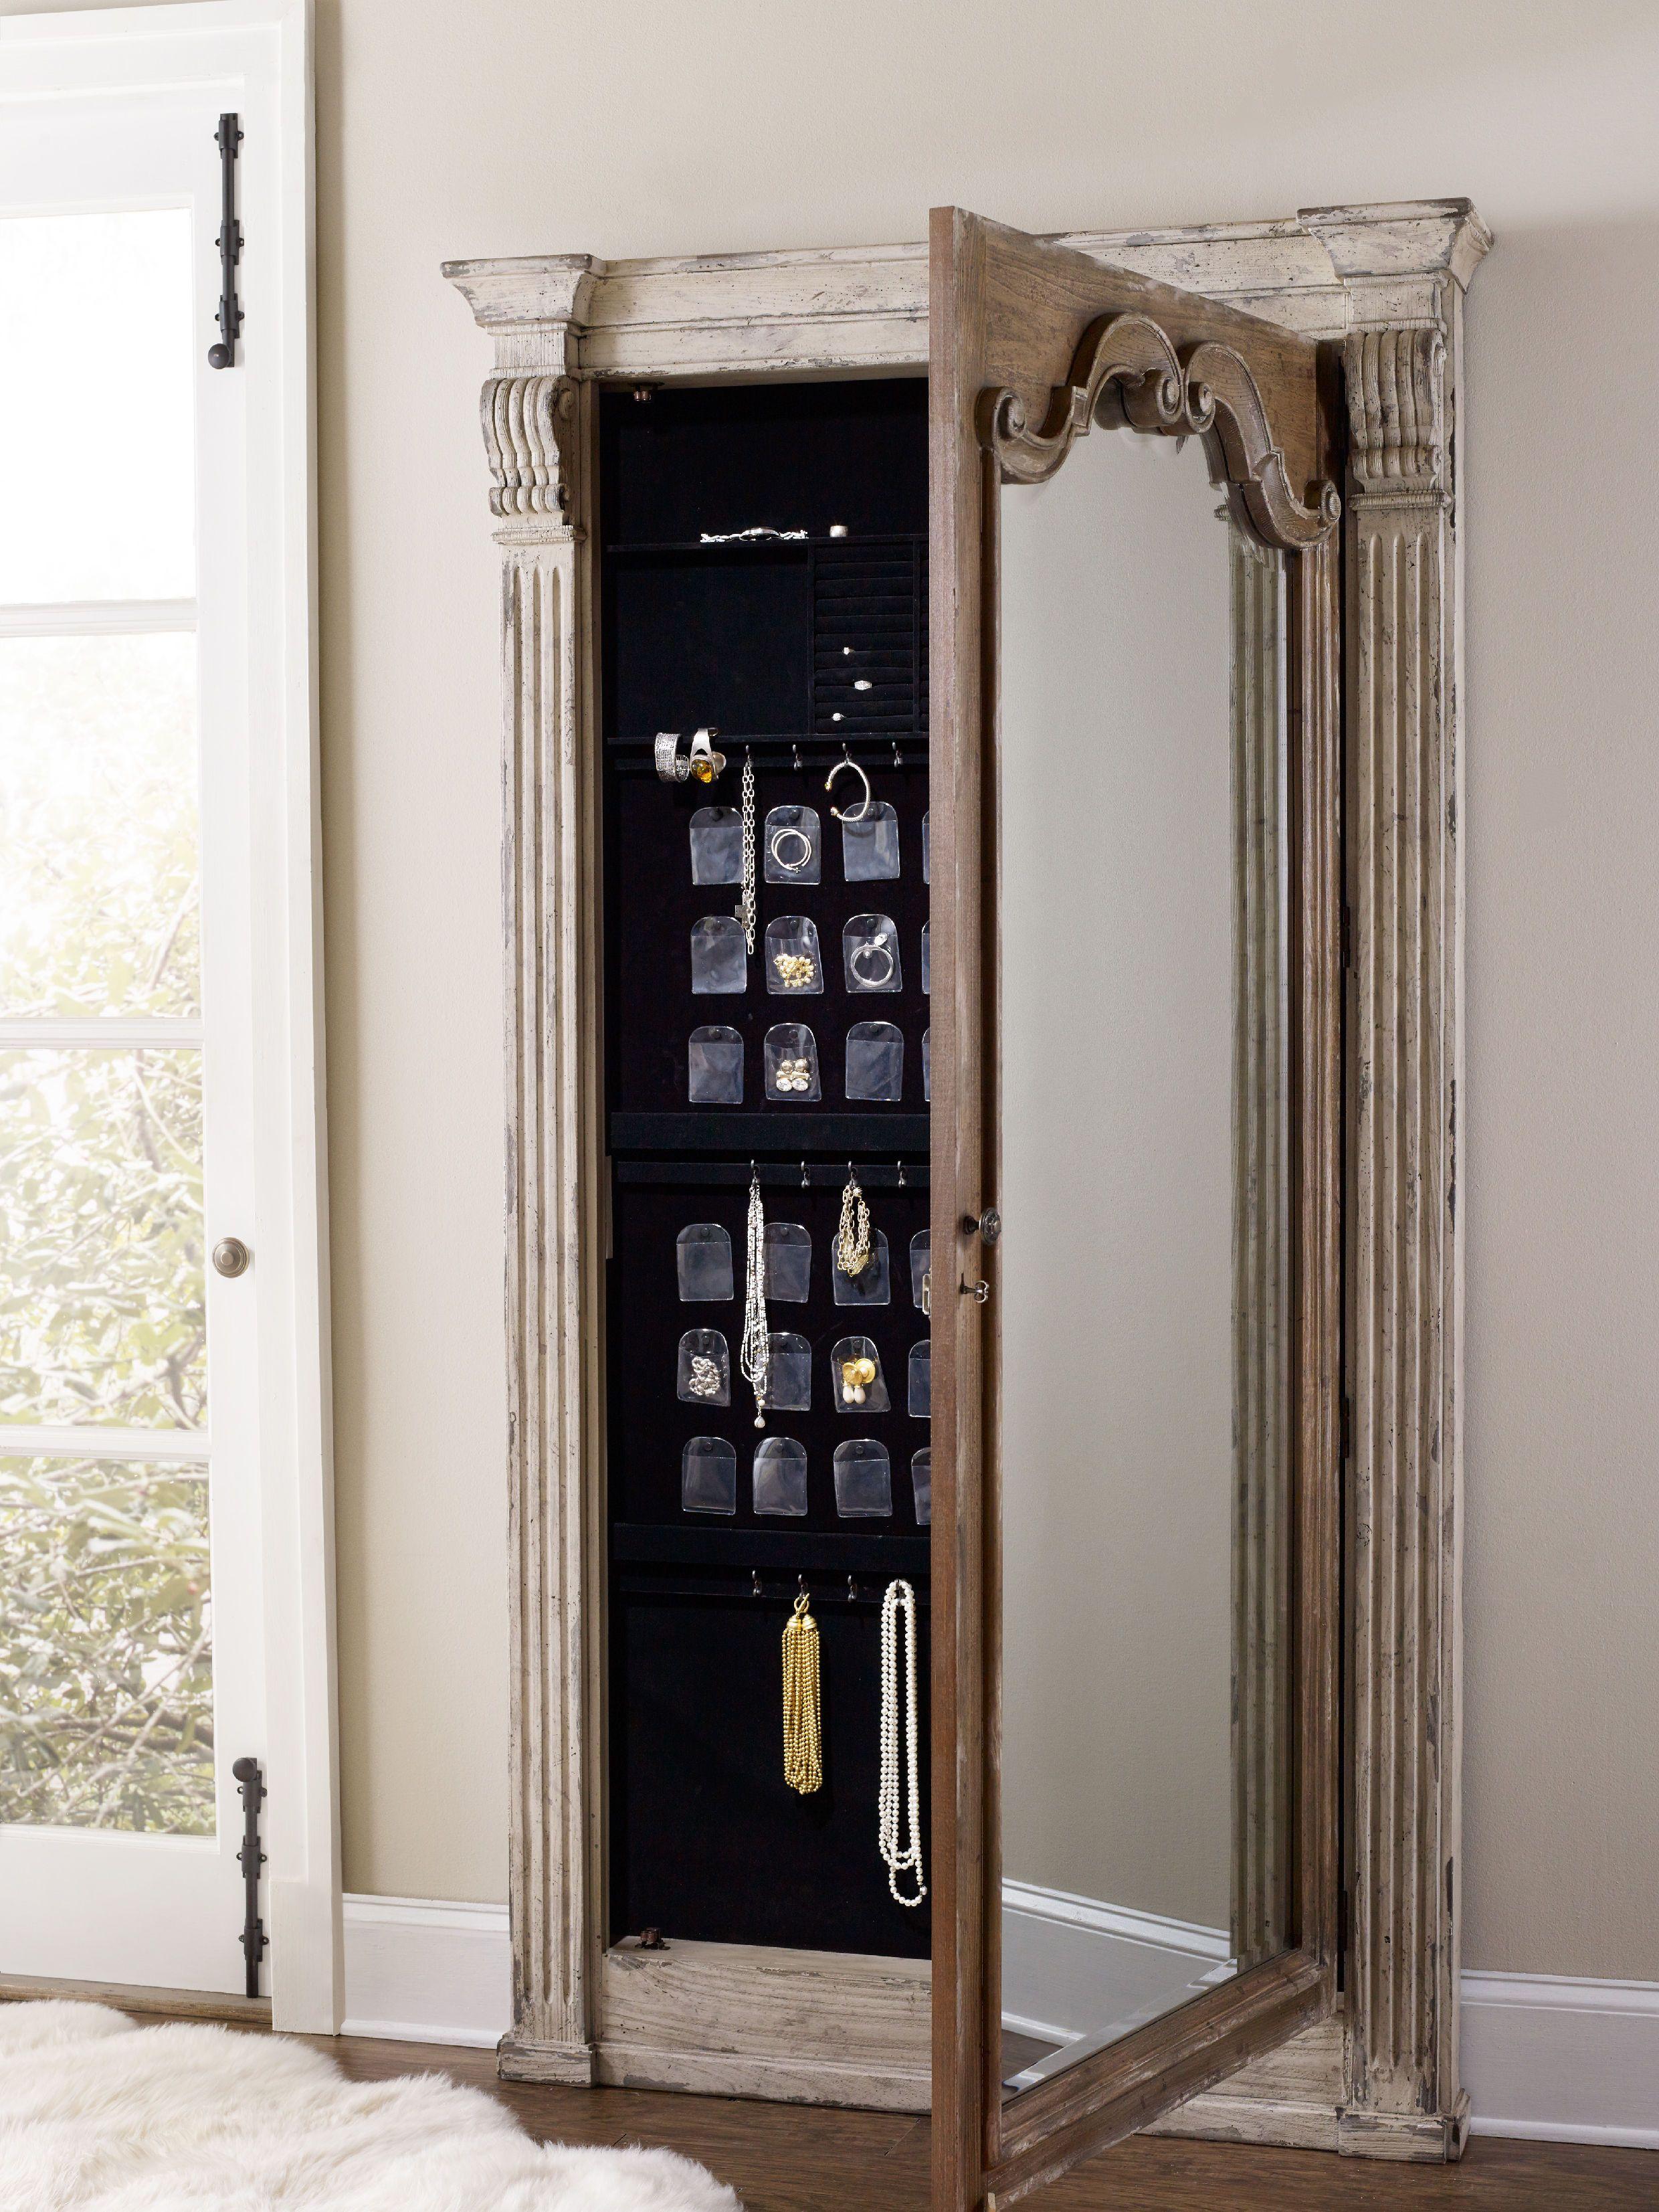 Hooker Furniture Chatelet Floor Mirror W/Jewelry Armoire Storage 5351 50003